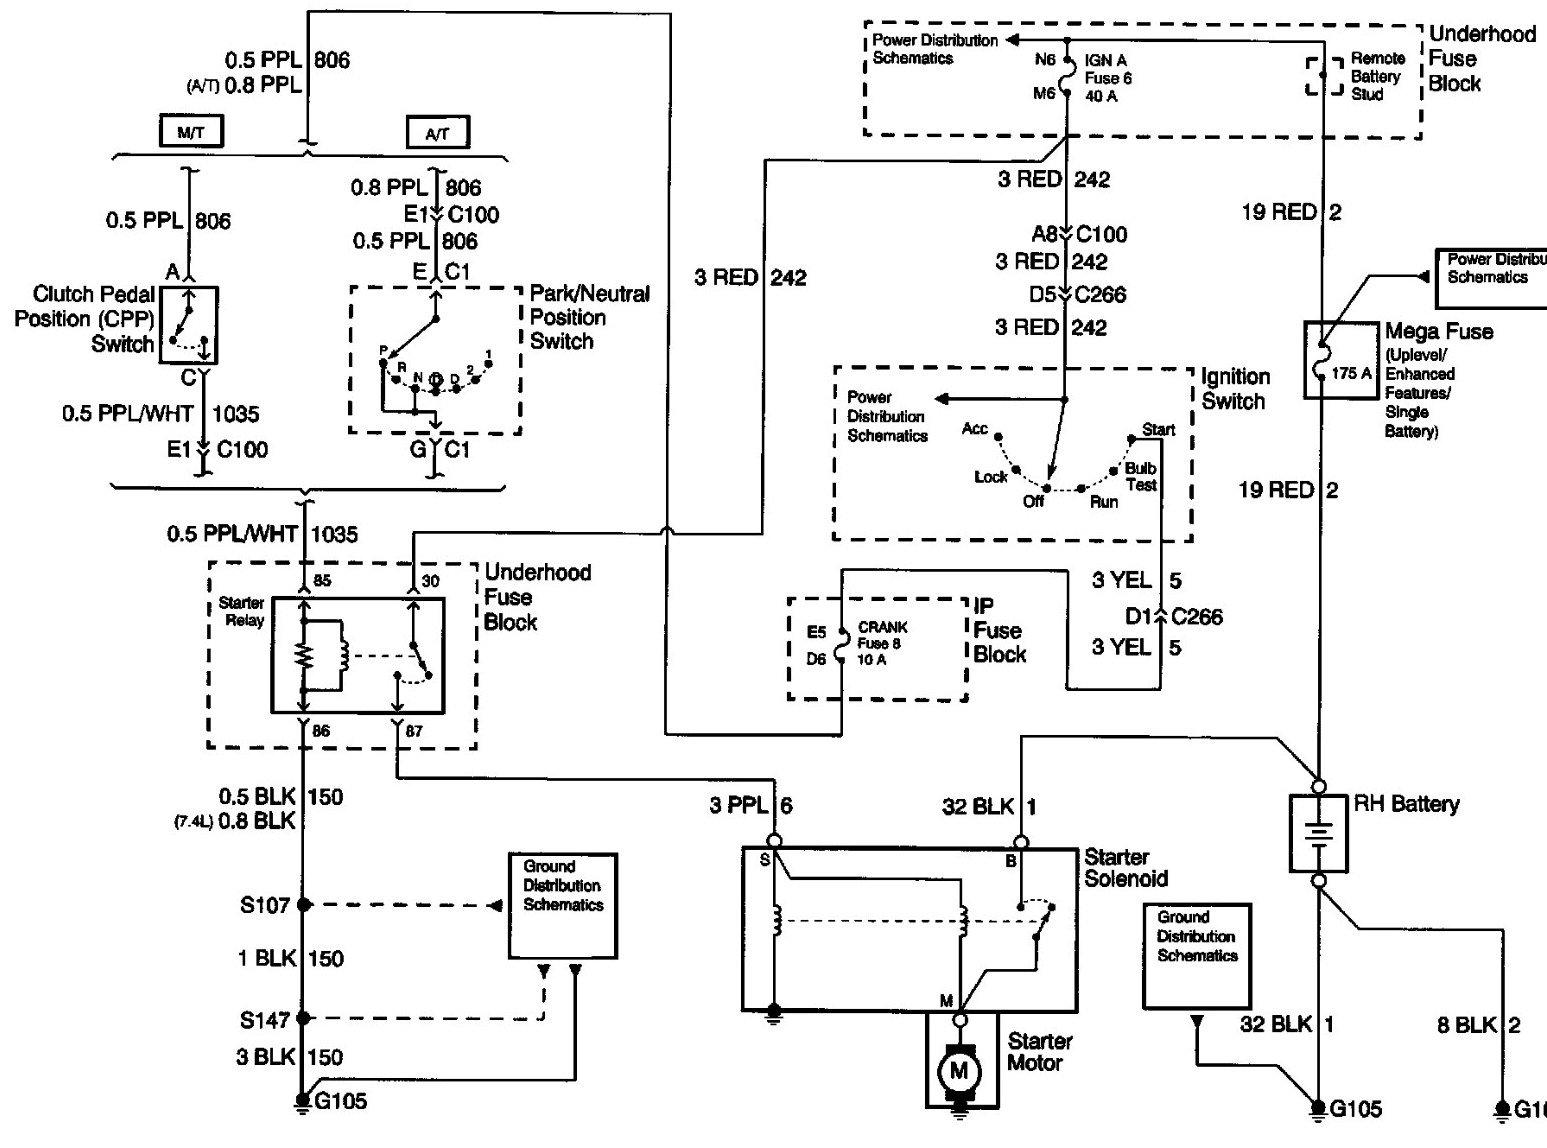 Wiring Schematic For 2011 Cadillac Escalade - 07 Mazda 3 Fuse Box Diagram  Passenger - gsxr750.yenpancane.jeanjaures37.fr | Bcm Wiring Schematics 2007 Cadillac Escalade Ext |  | Wiring Diagram Resource